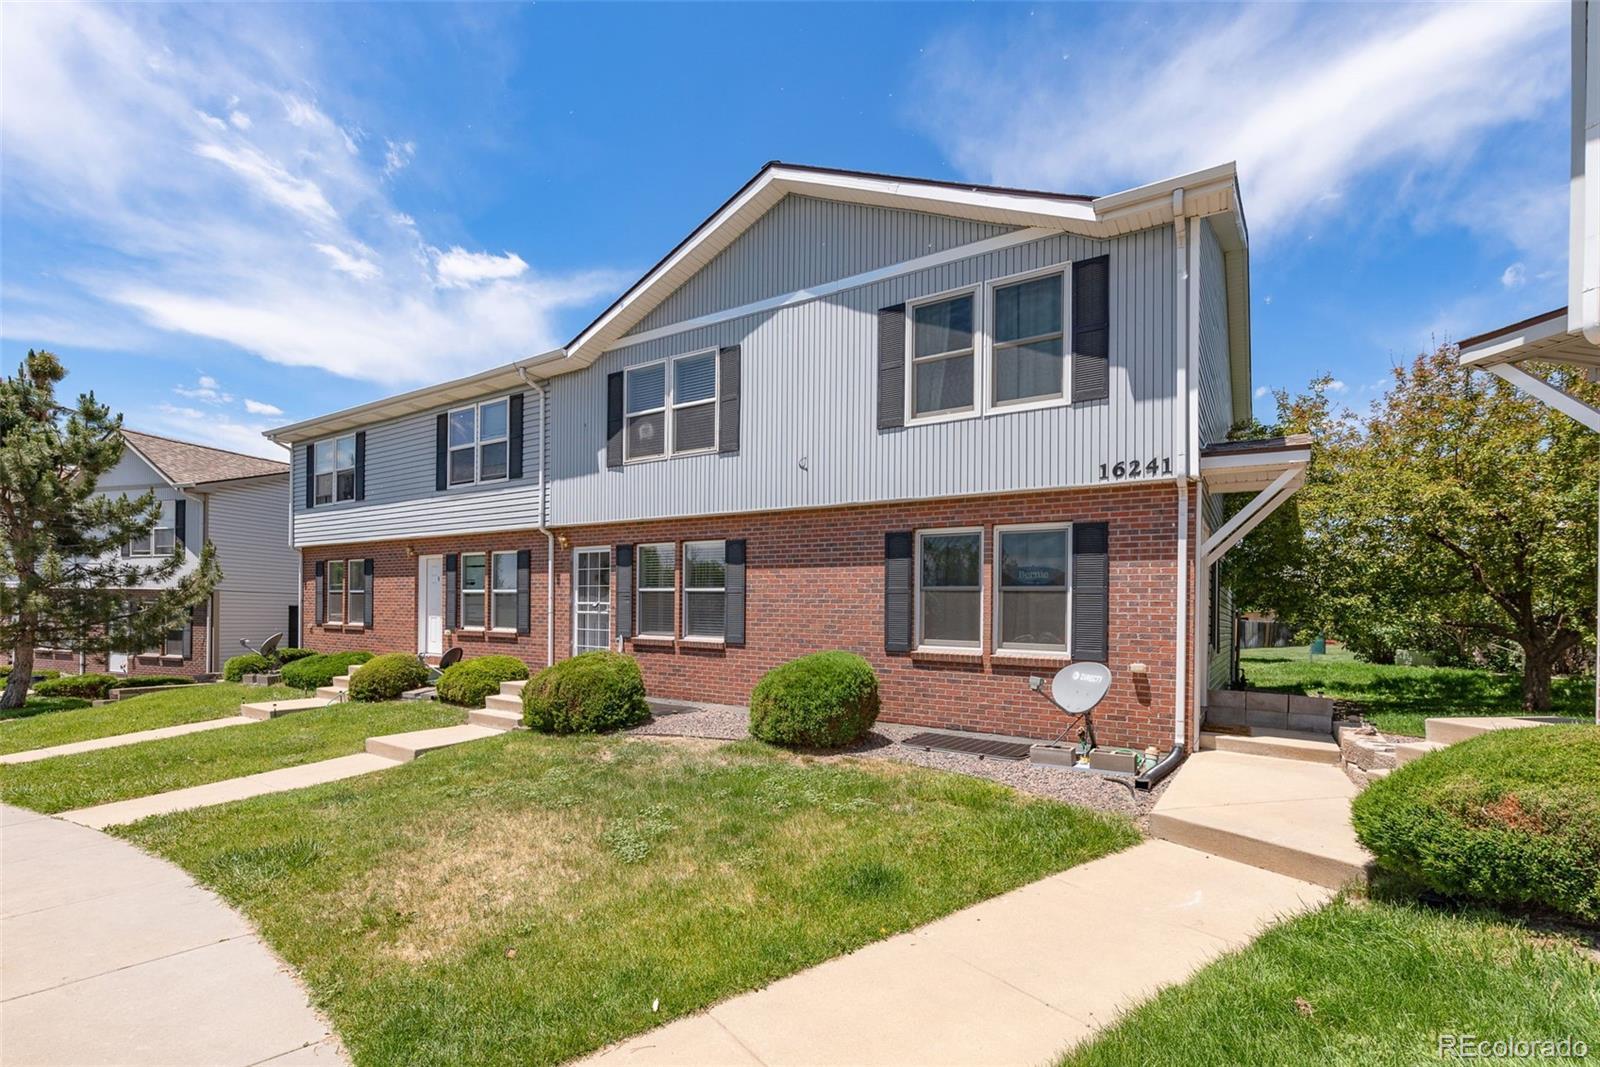 16241 E 17th Place #C Property Photo - Aurora, CO real estate listing